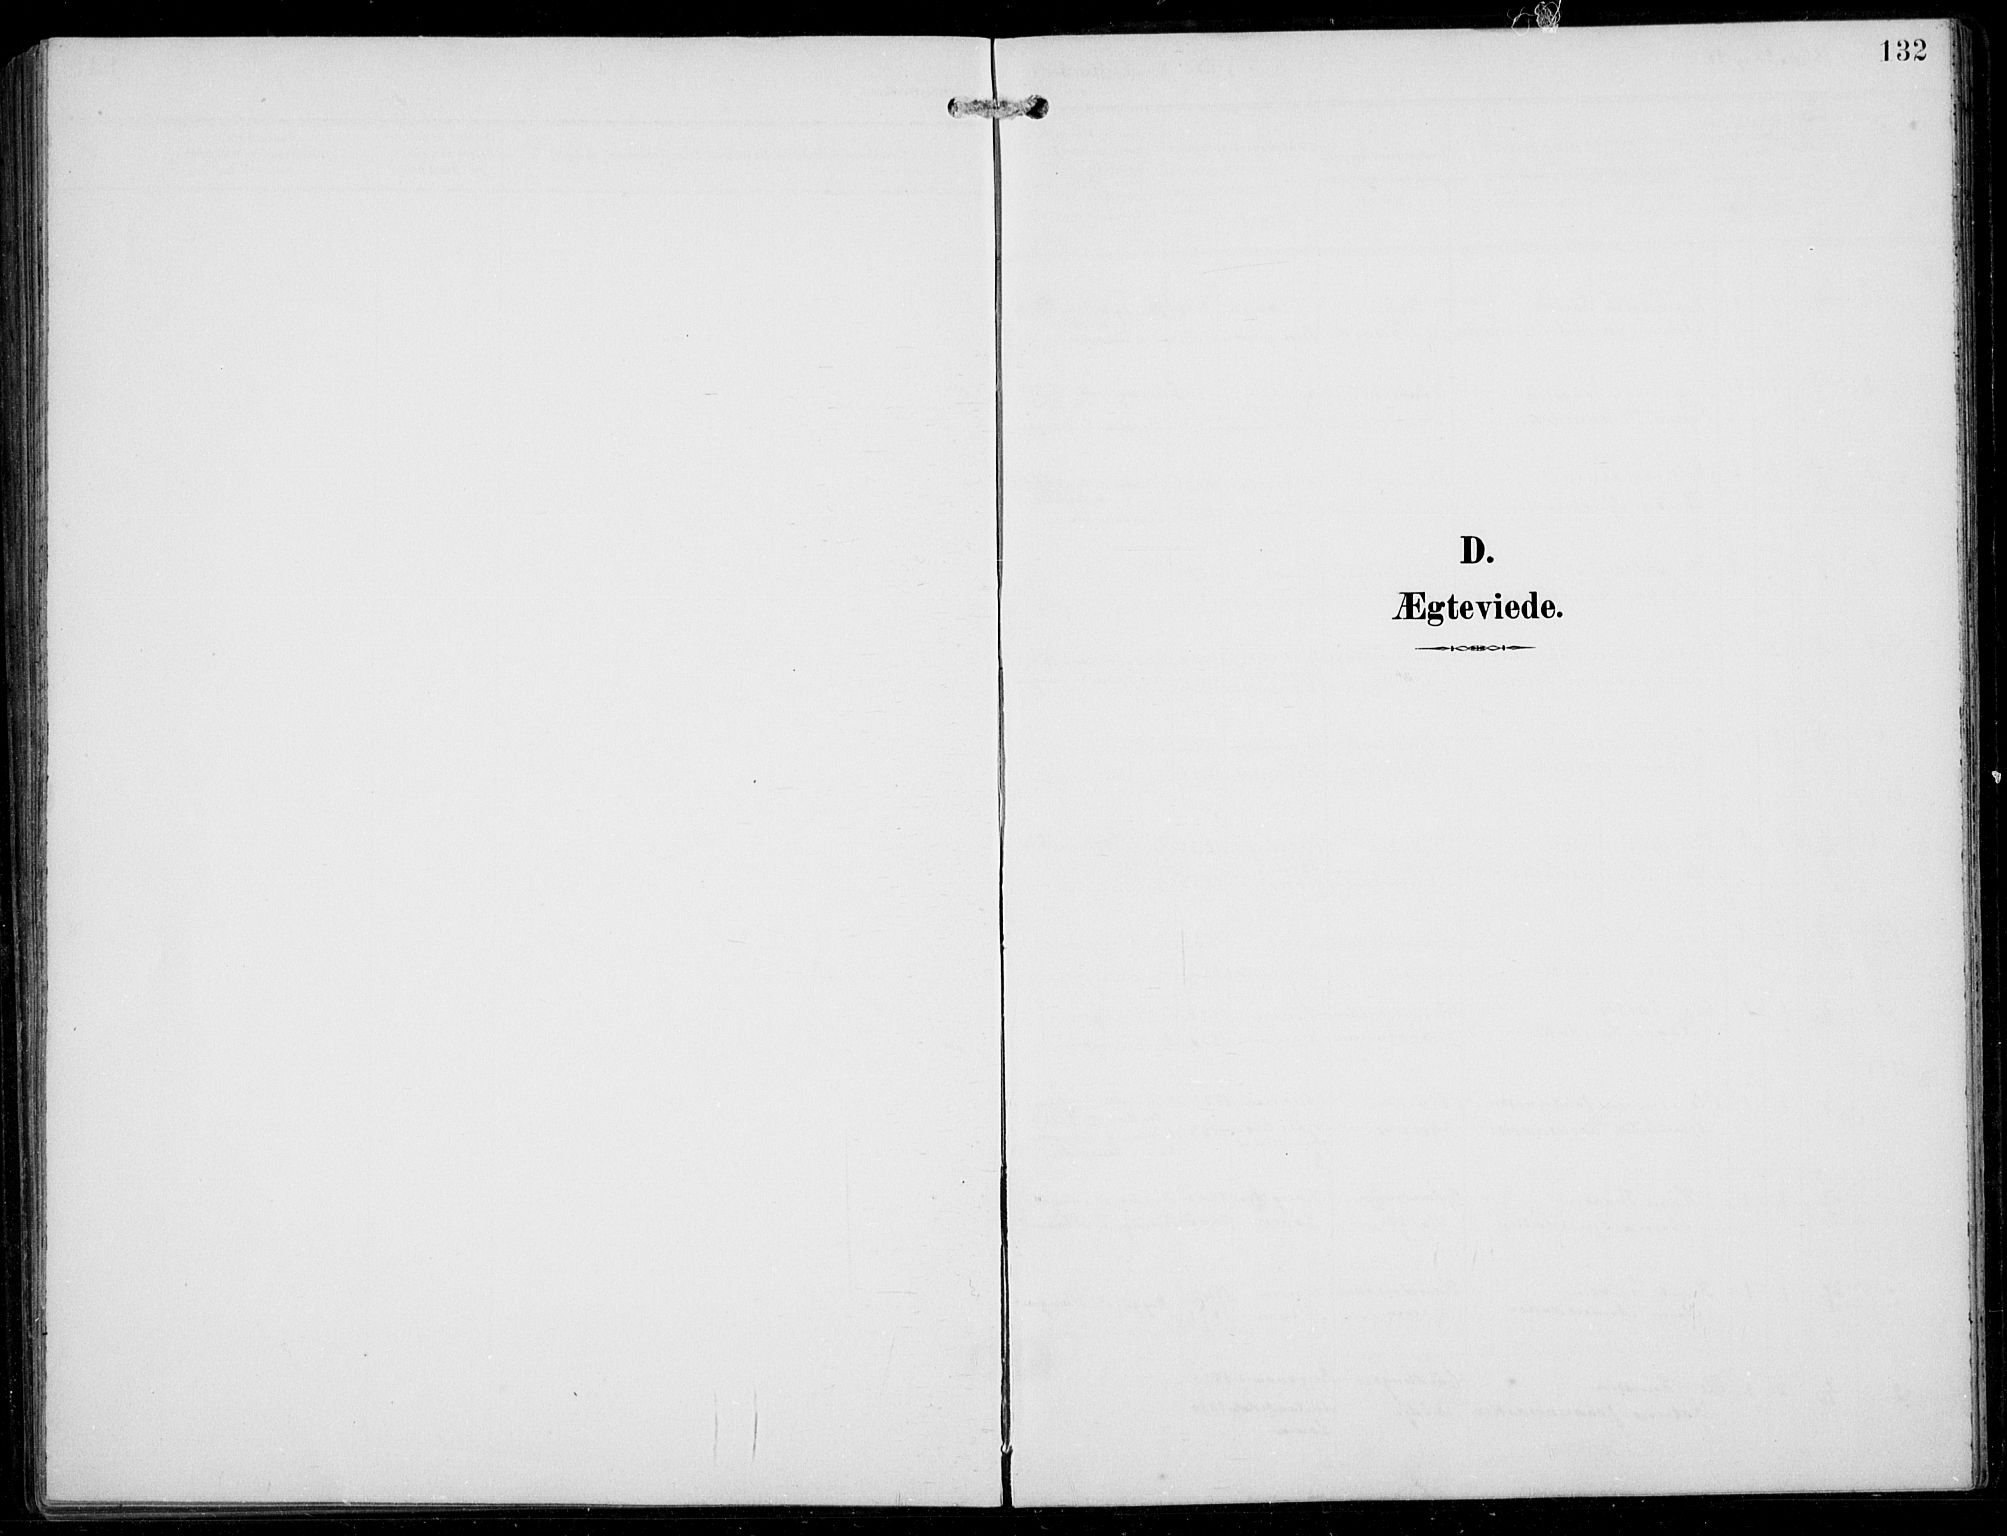 SAB, Aurland sokneprestembete, H/Hb/Hba/L0003: Parish register (copy) no. A 3, 1896-1939, p. 132